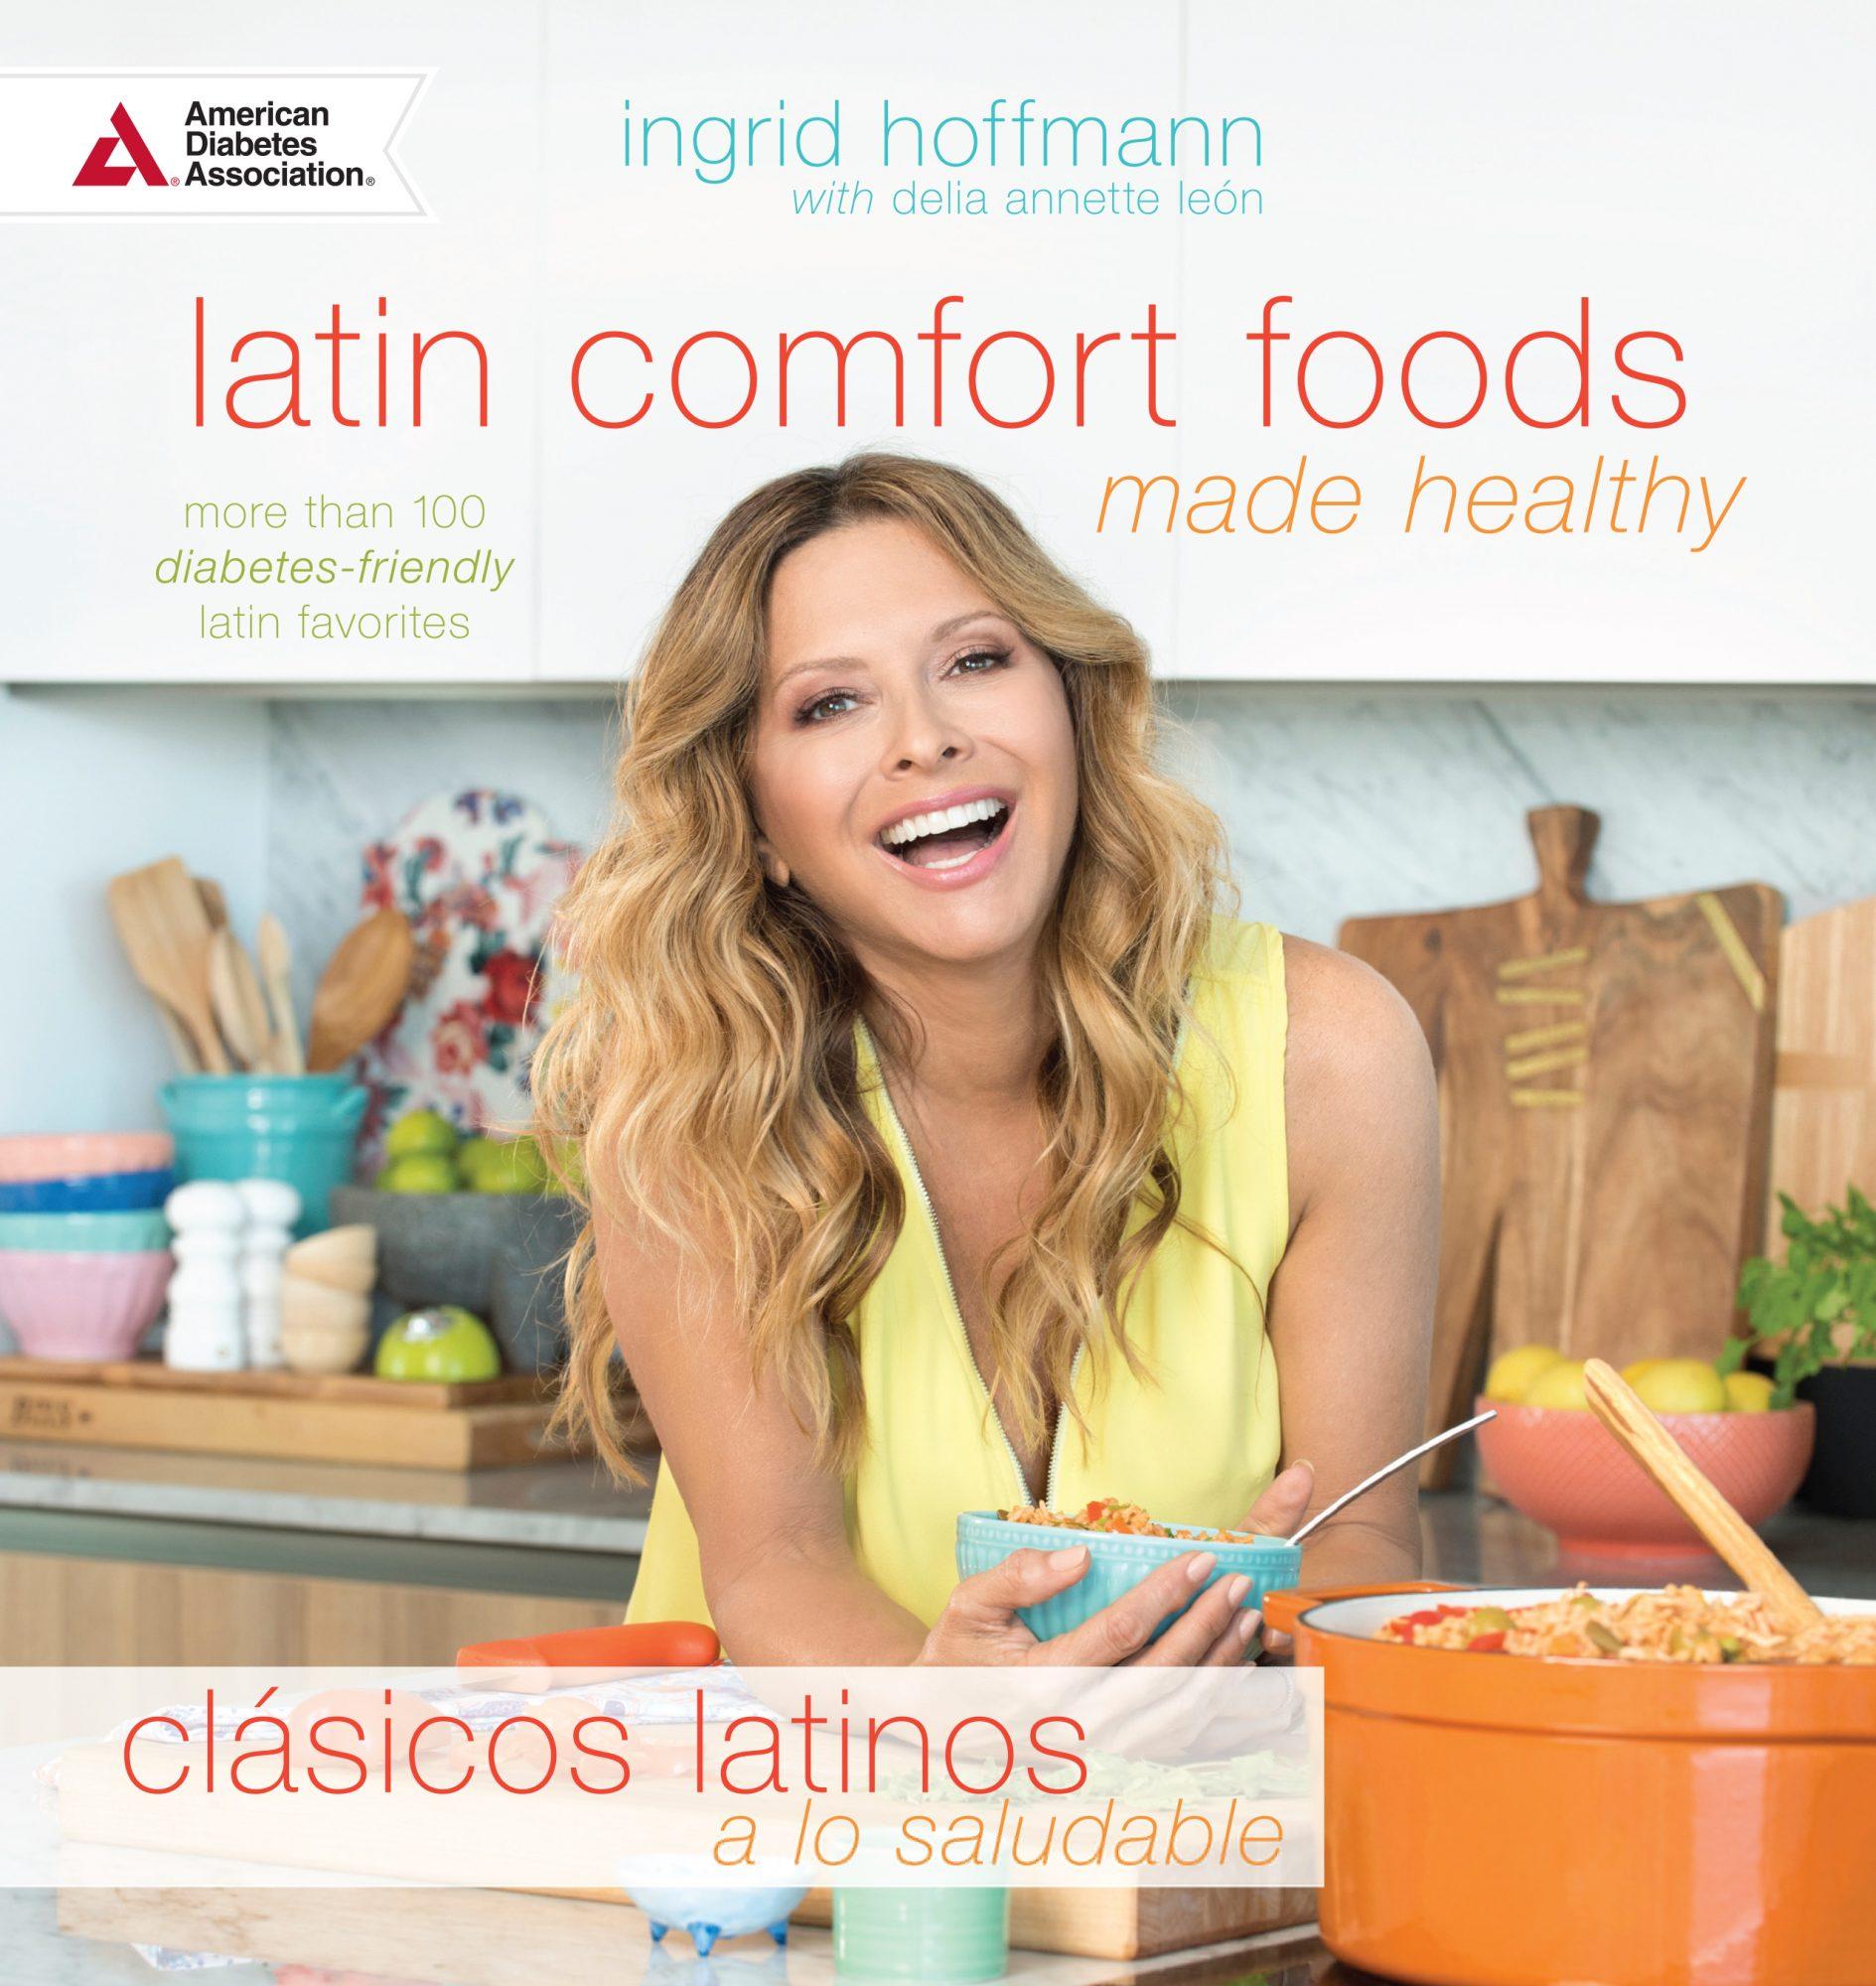 latincomfort_coverspread_fin.jpg